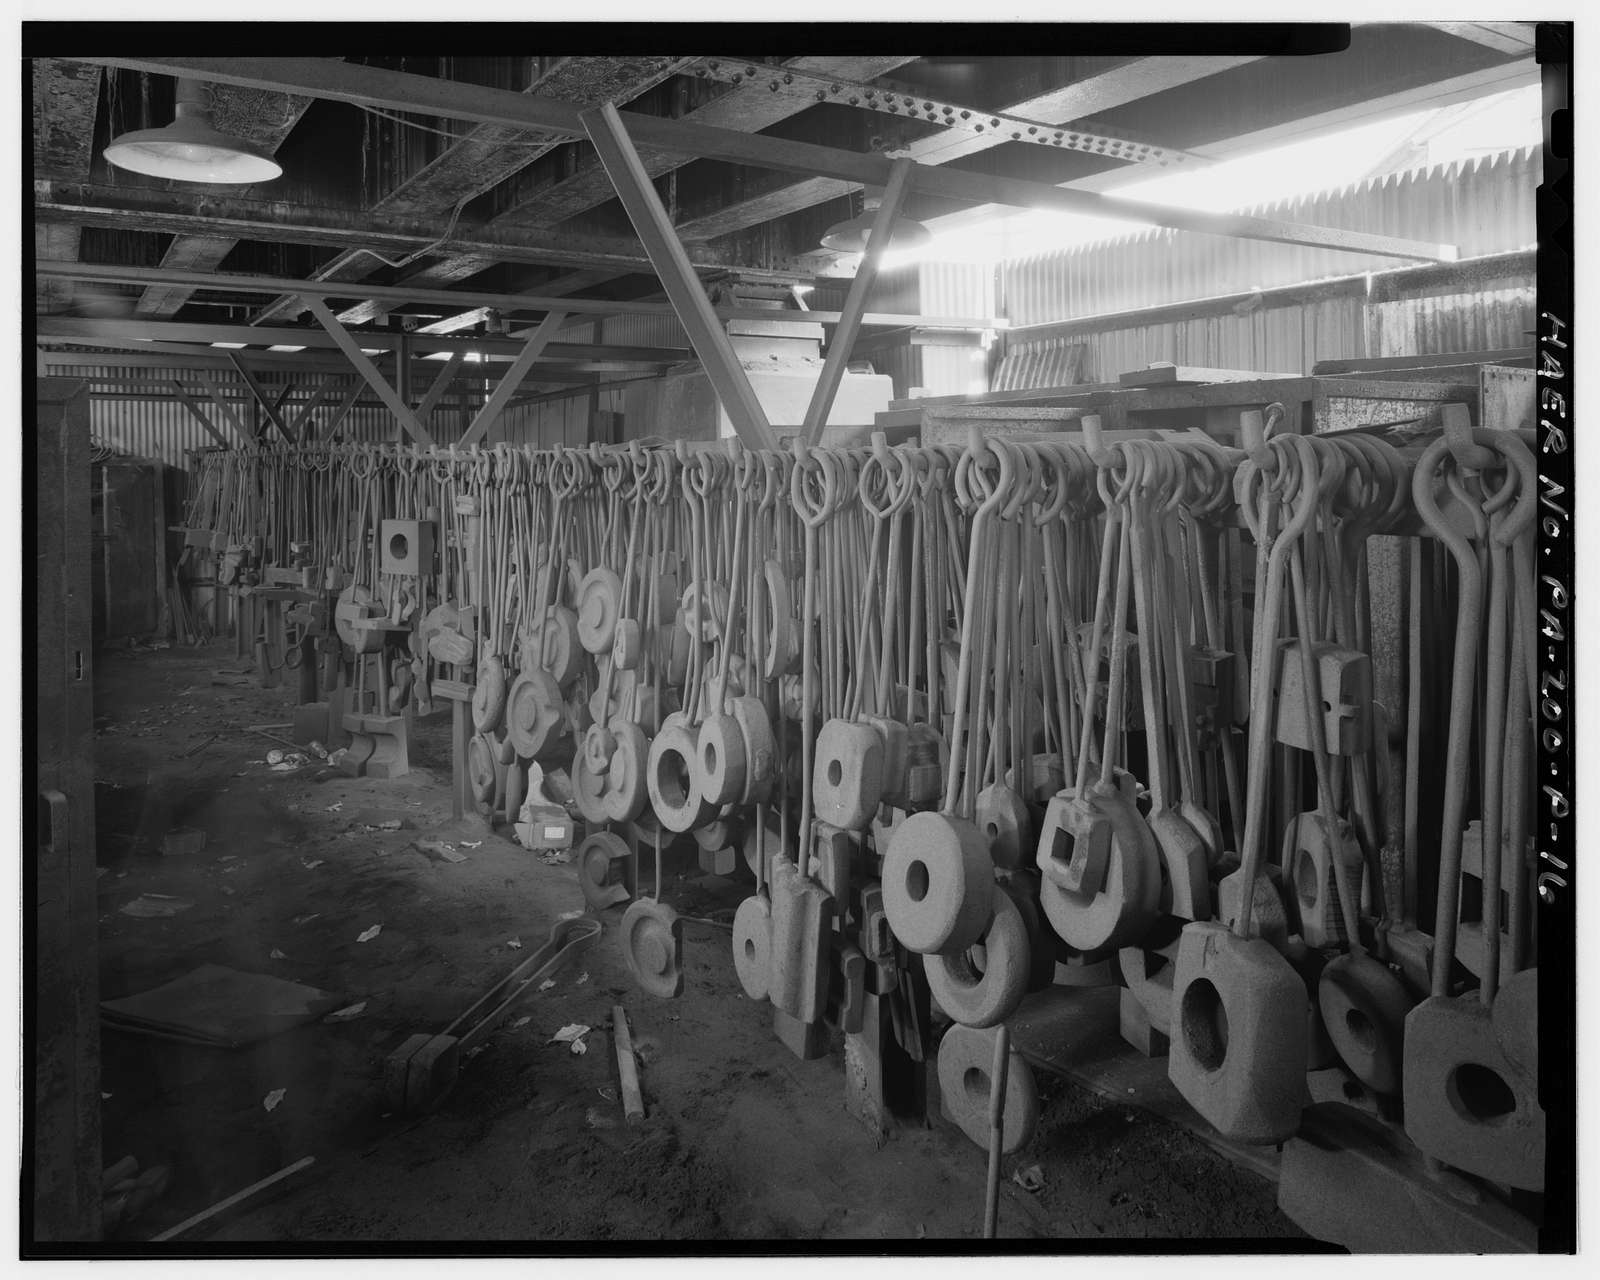 U.S. Steel Homestead Works, Auxiliary Buildings & Shops, Along Monongahela River, Homestead, Allegheny County, PA